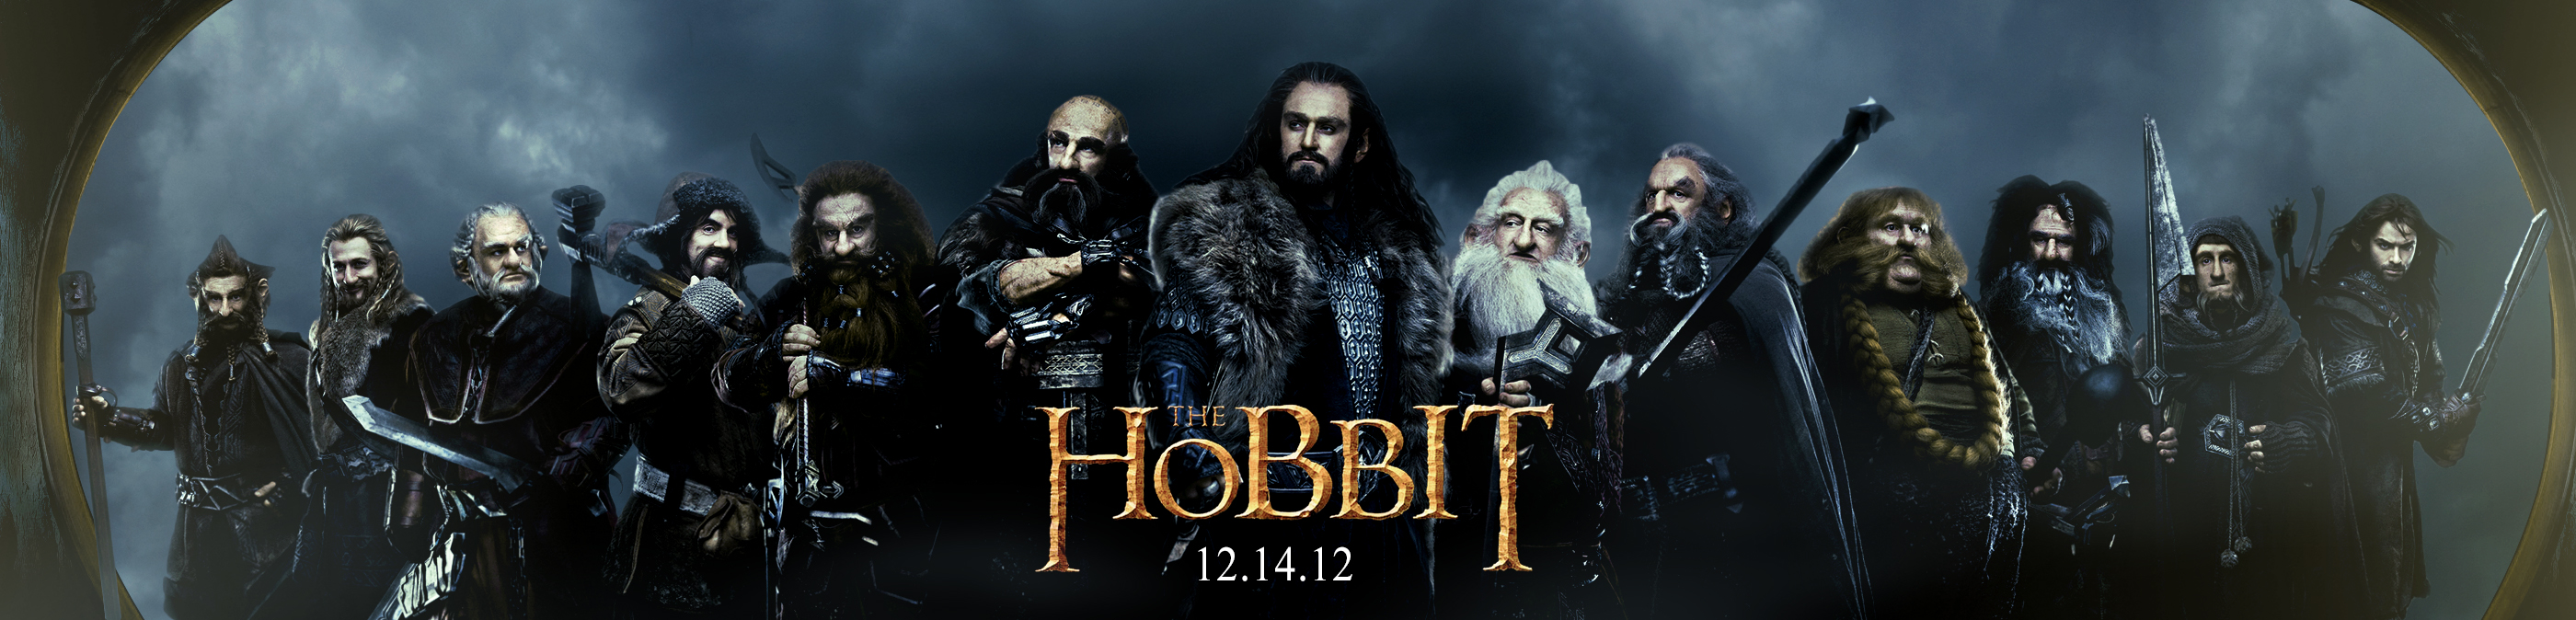 The Hobbit | Armitage Agonistes